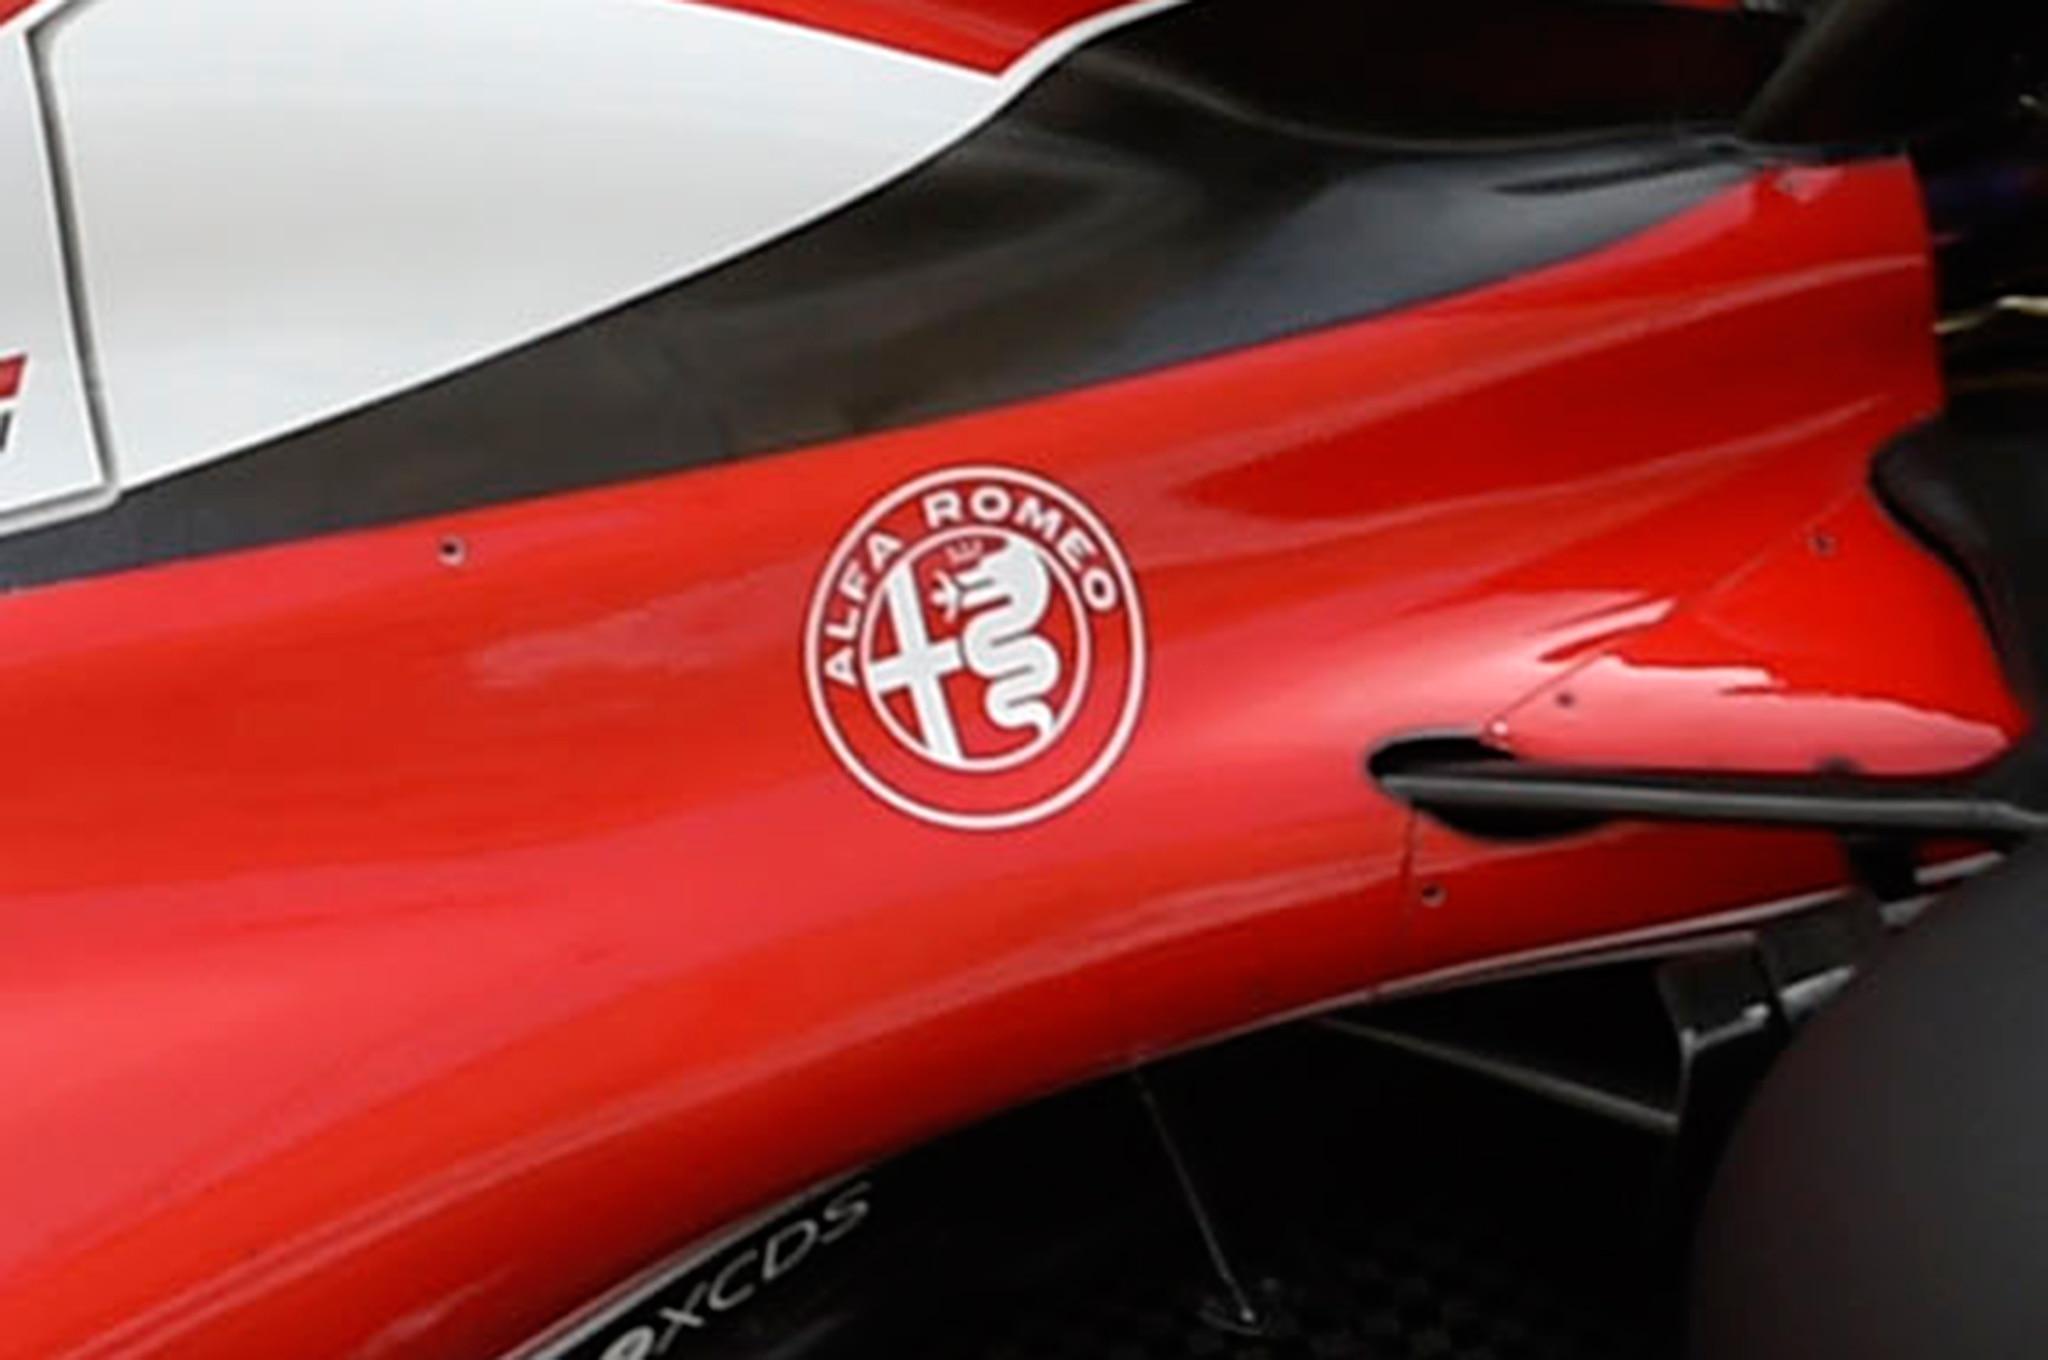 Alfa Romeo Badge On Ferrari F1 Car